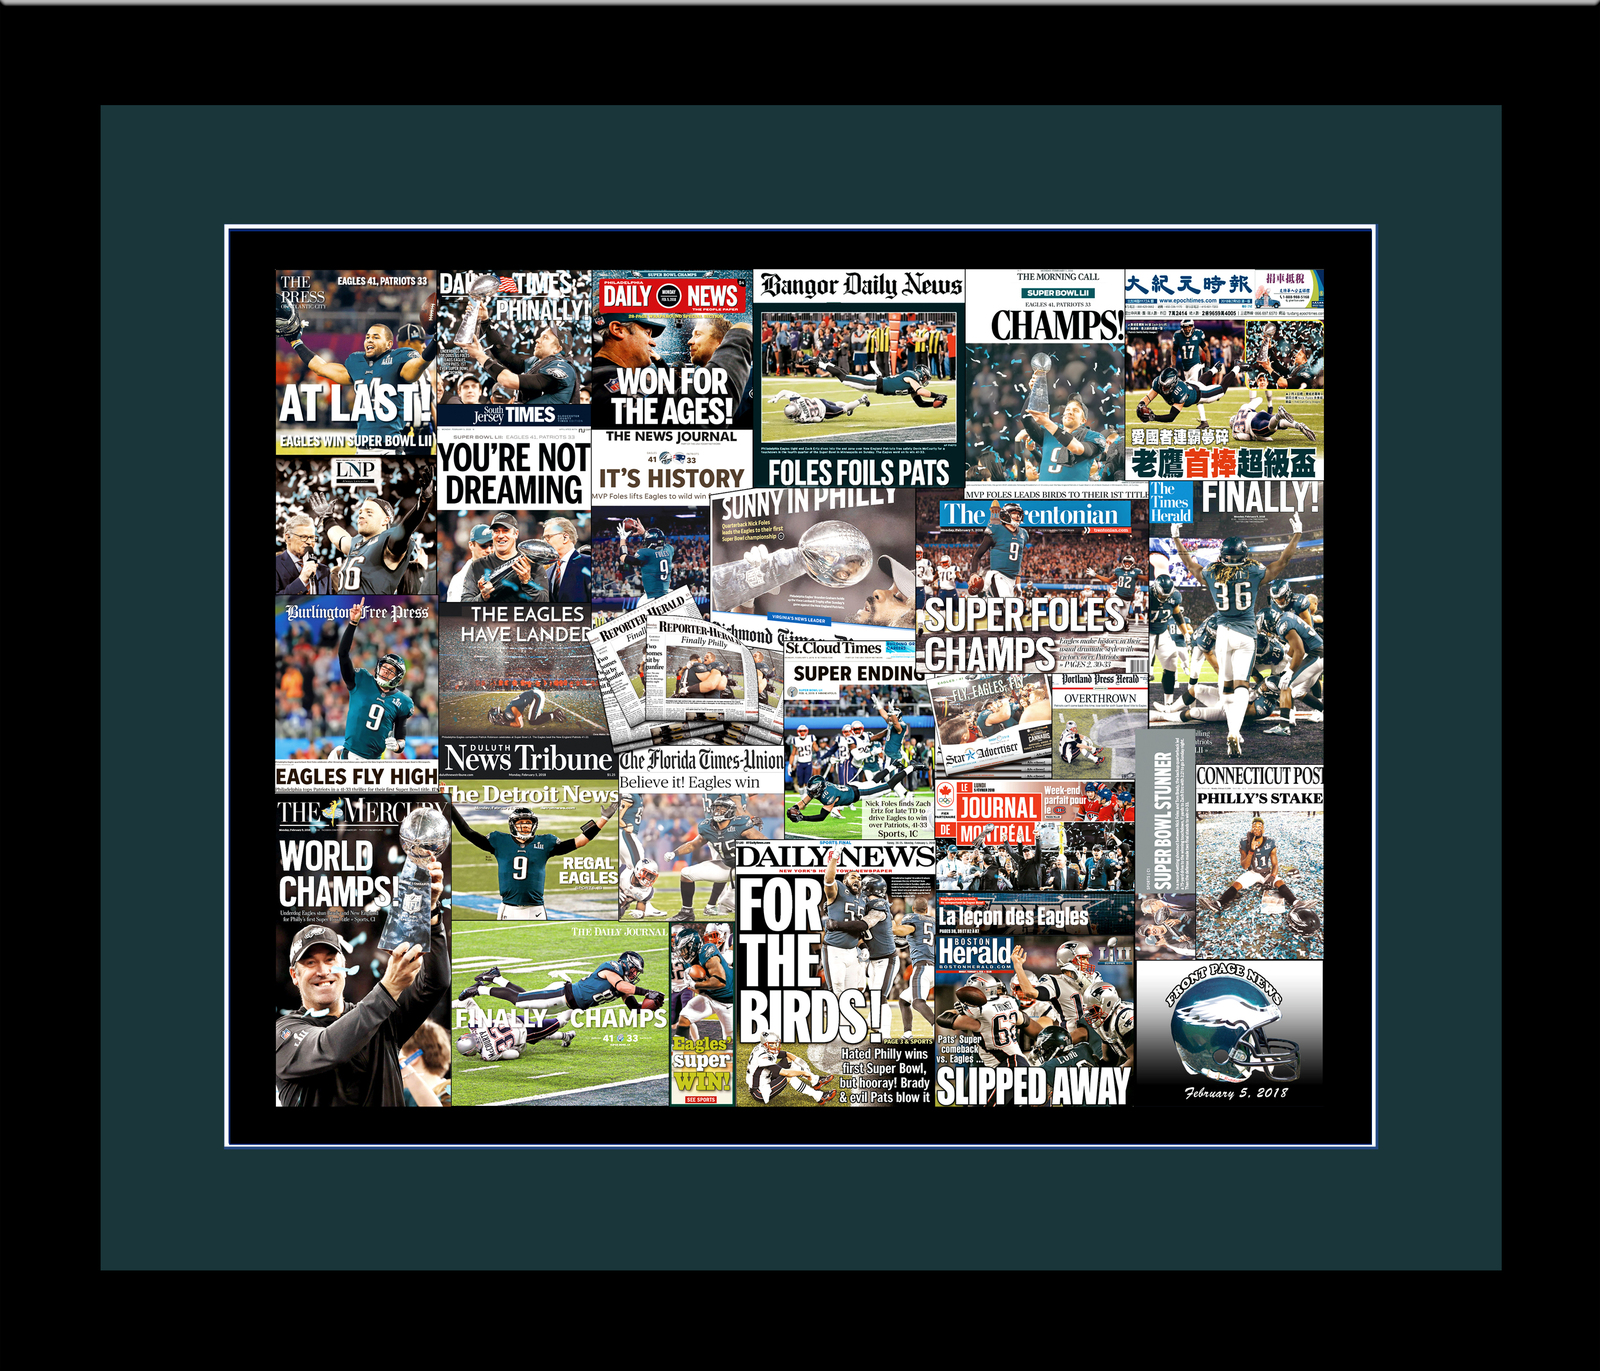 Philadelphia Eagles 2018 Super Bowl Newspaper Headline Collage Print.